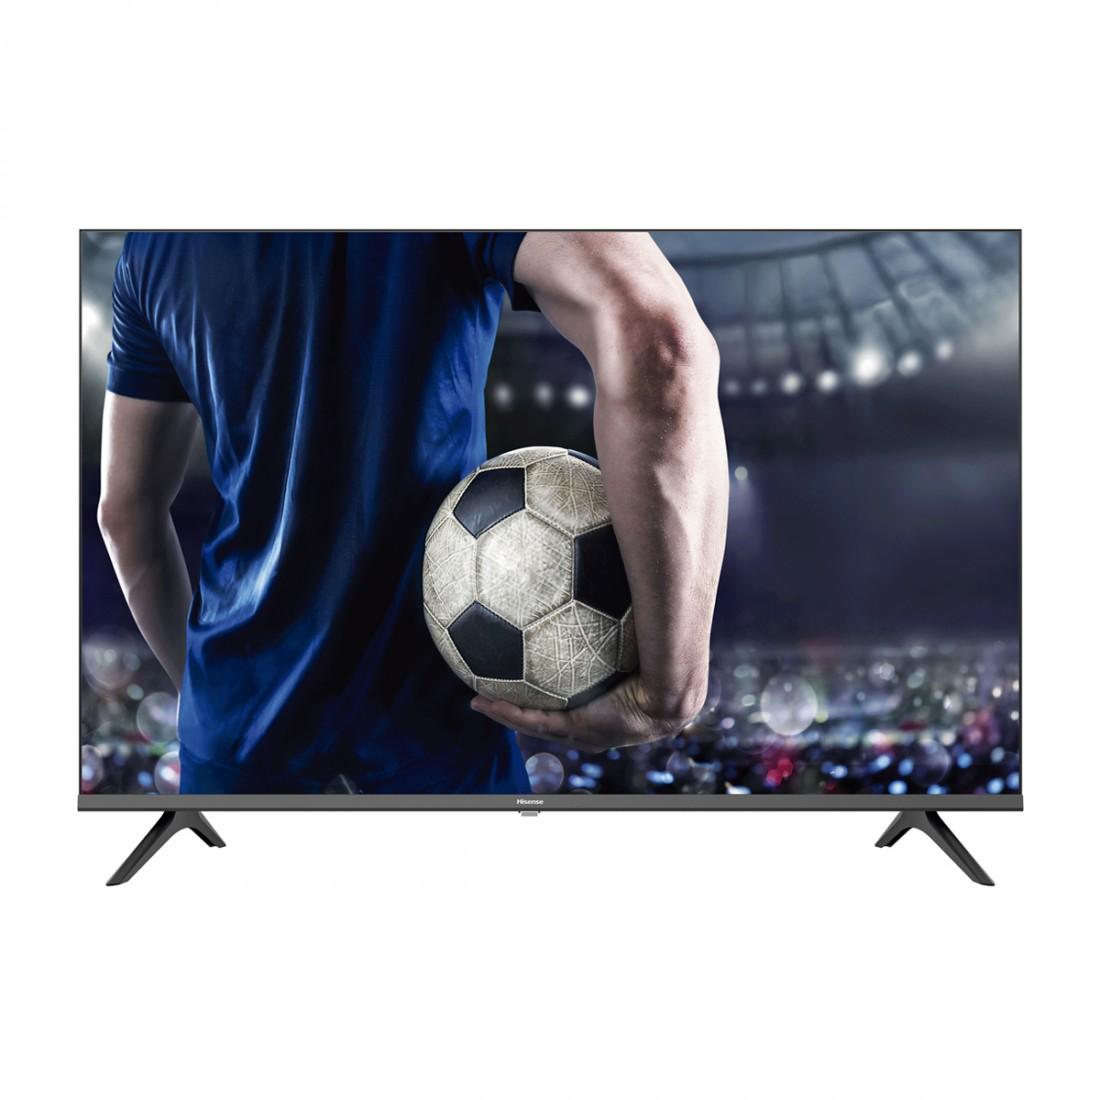 "TV LED - Hisense 32A5100F, Eficiencia A, 4K, 32"""